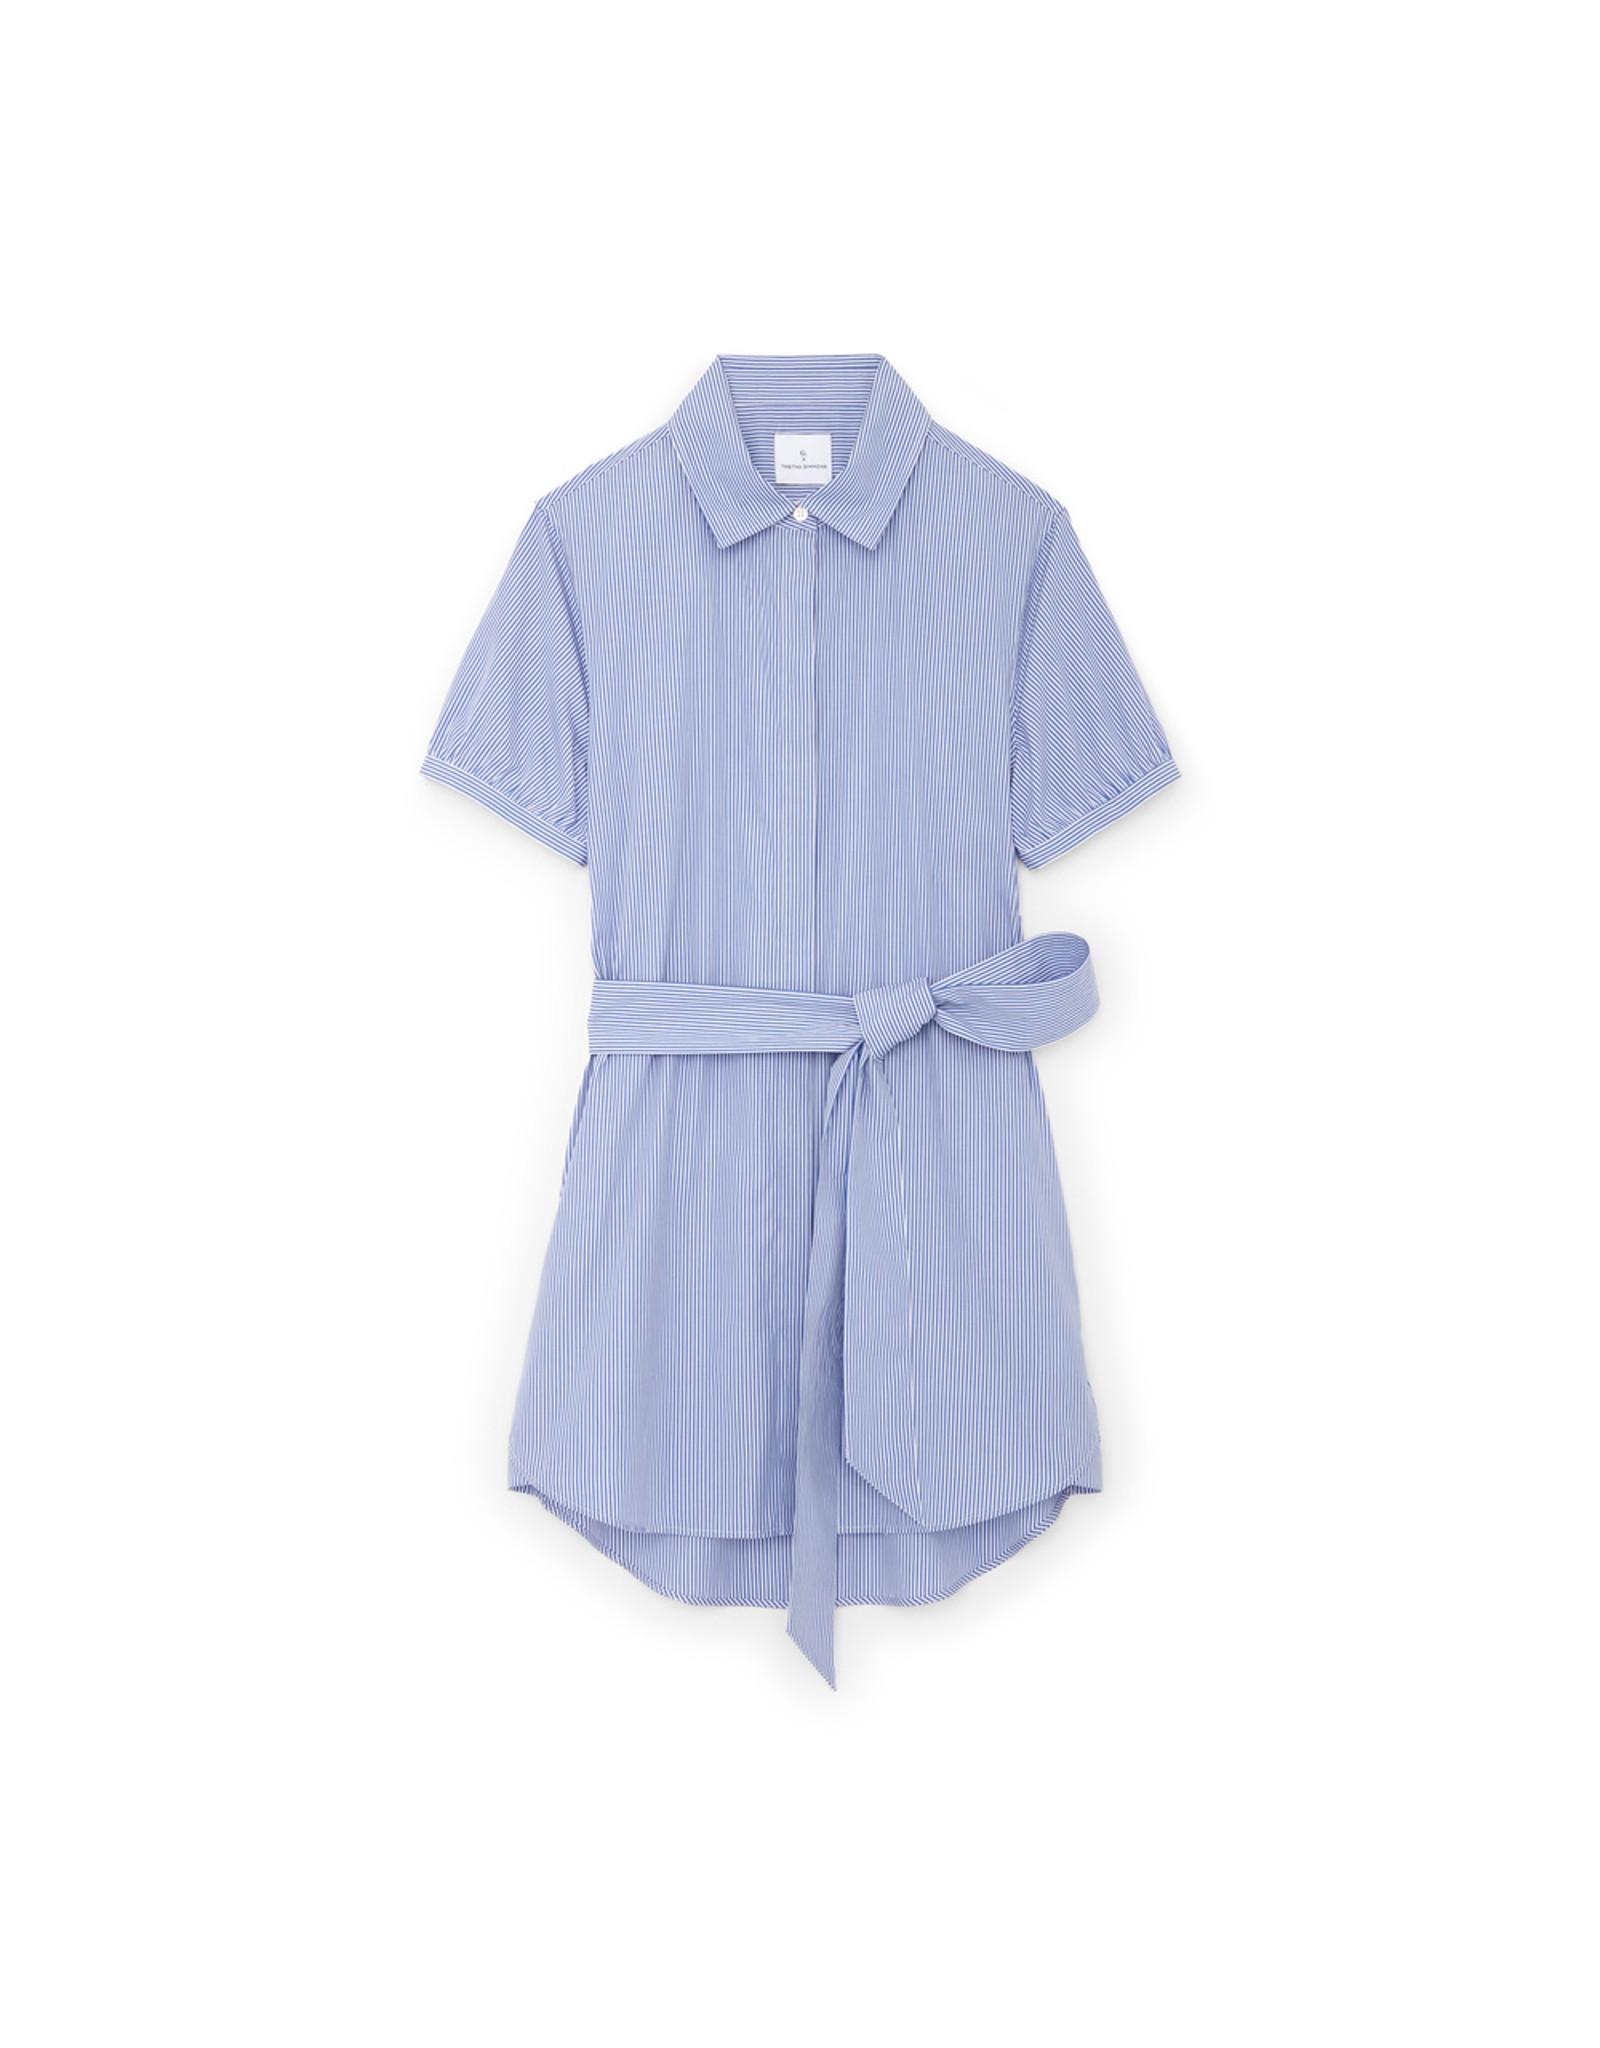 G. Label Cusco Mini Shirt Dress (color: Blue & White Stripe, Size: M)